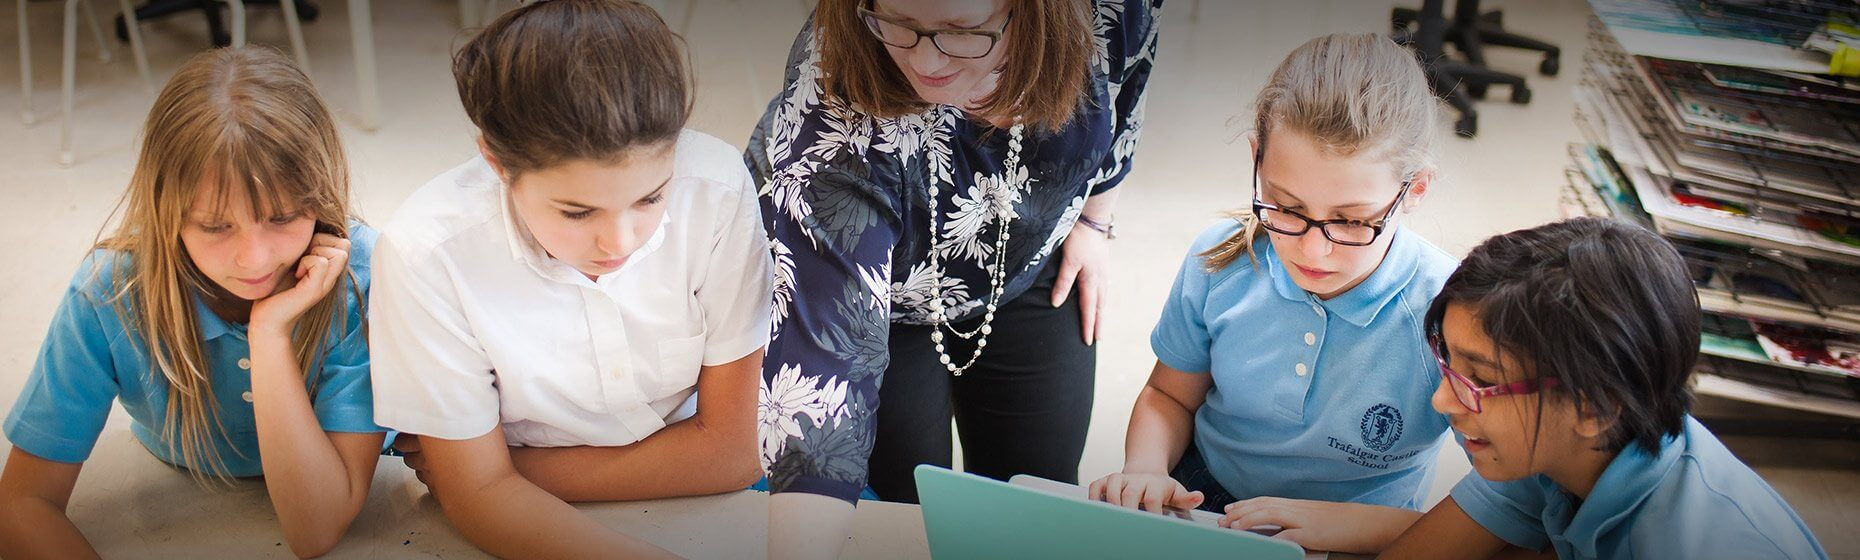 Collaborative Classroom Curriculum ~ Collaborative classroom trafalgar castle school